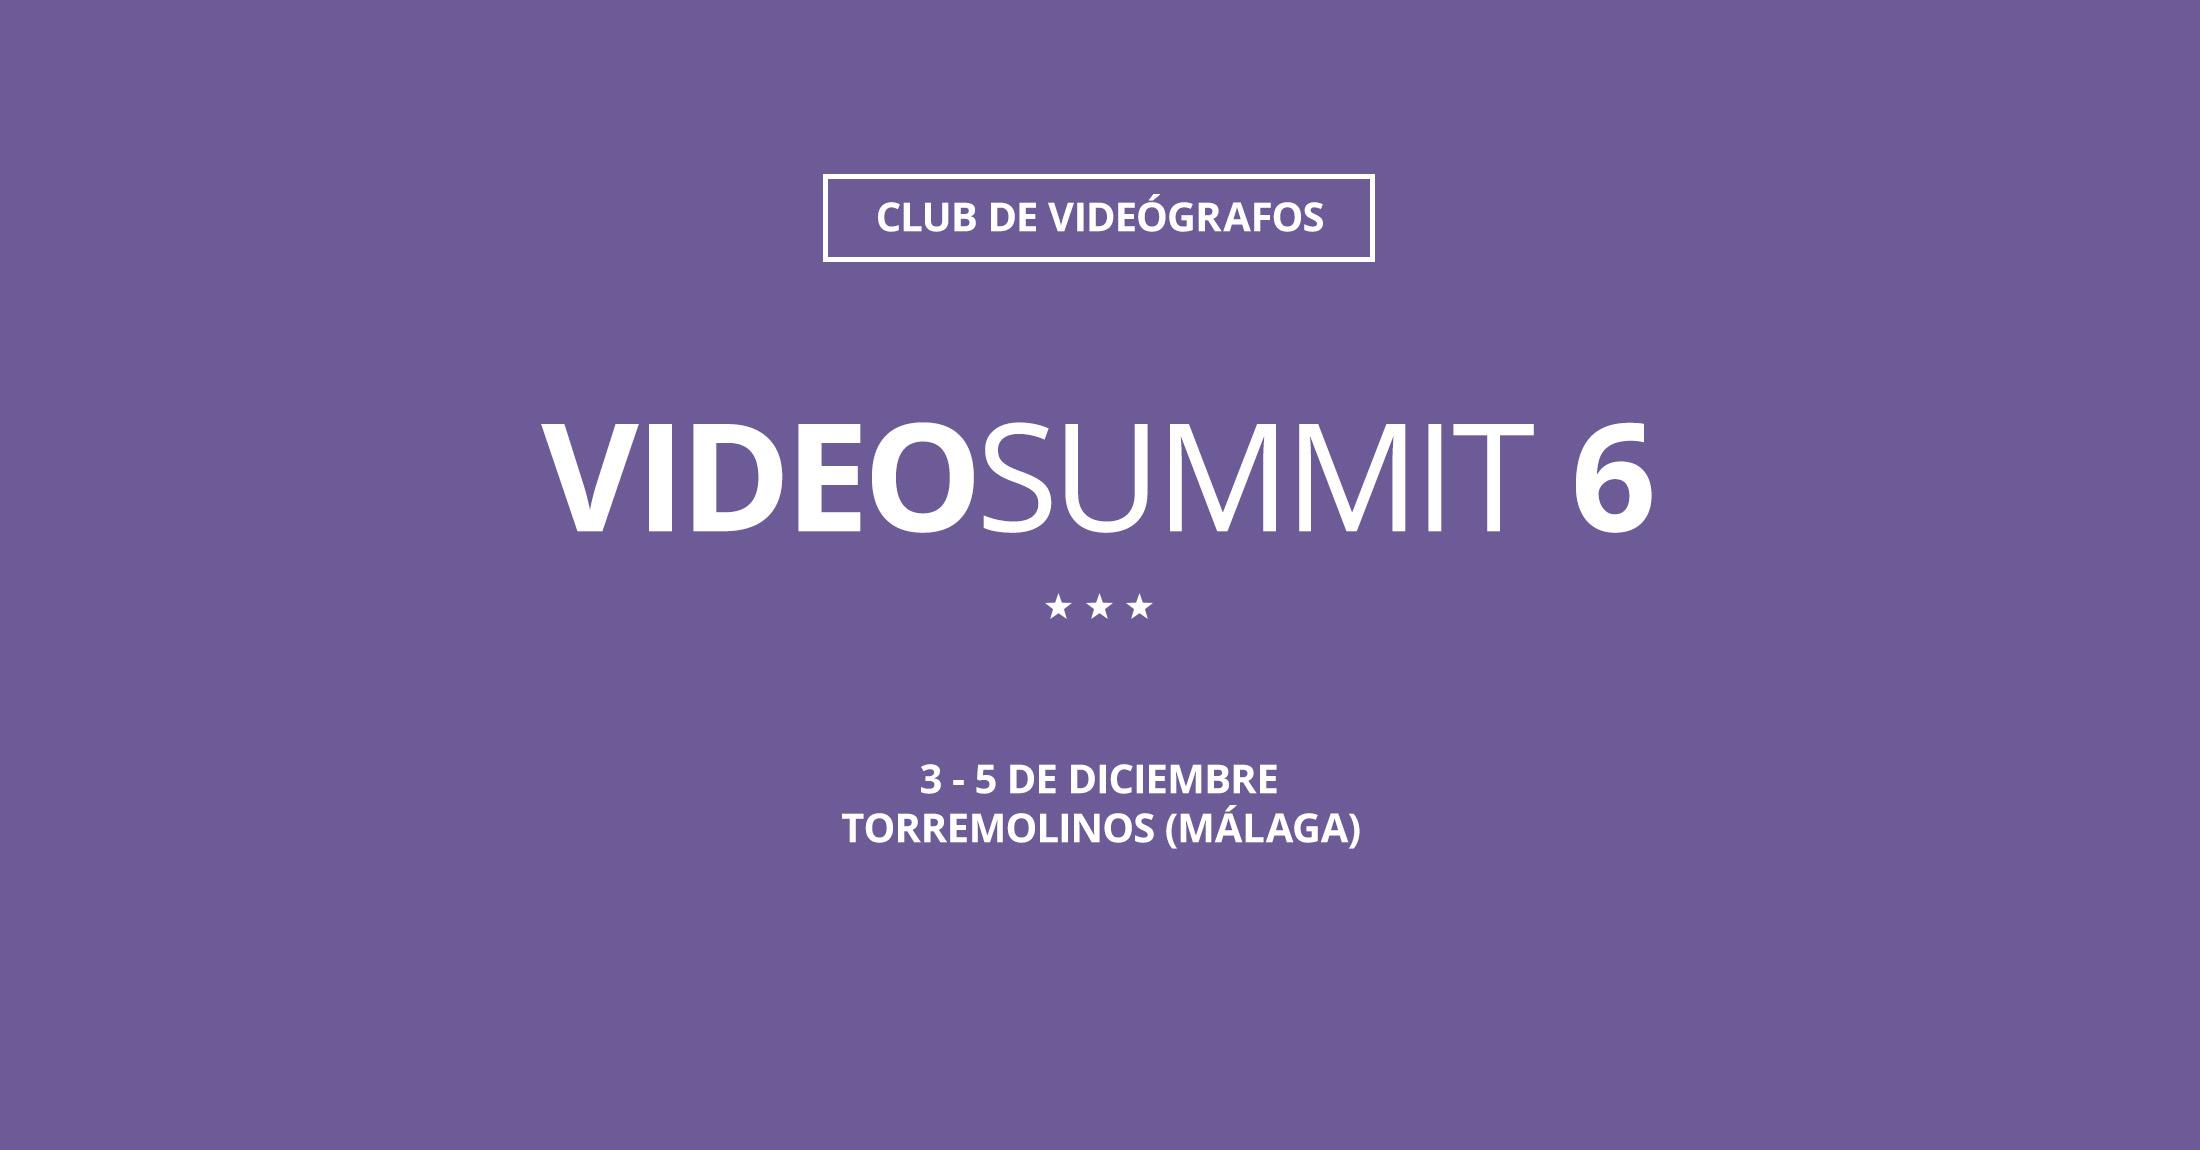 videosummit-6